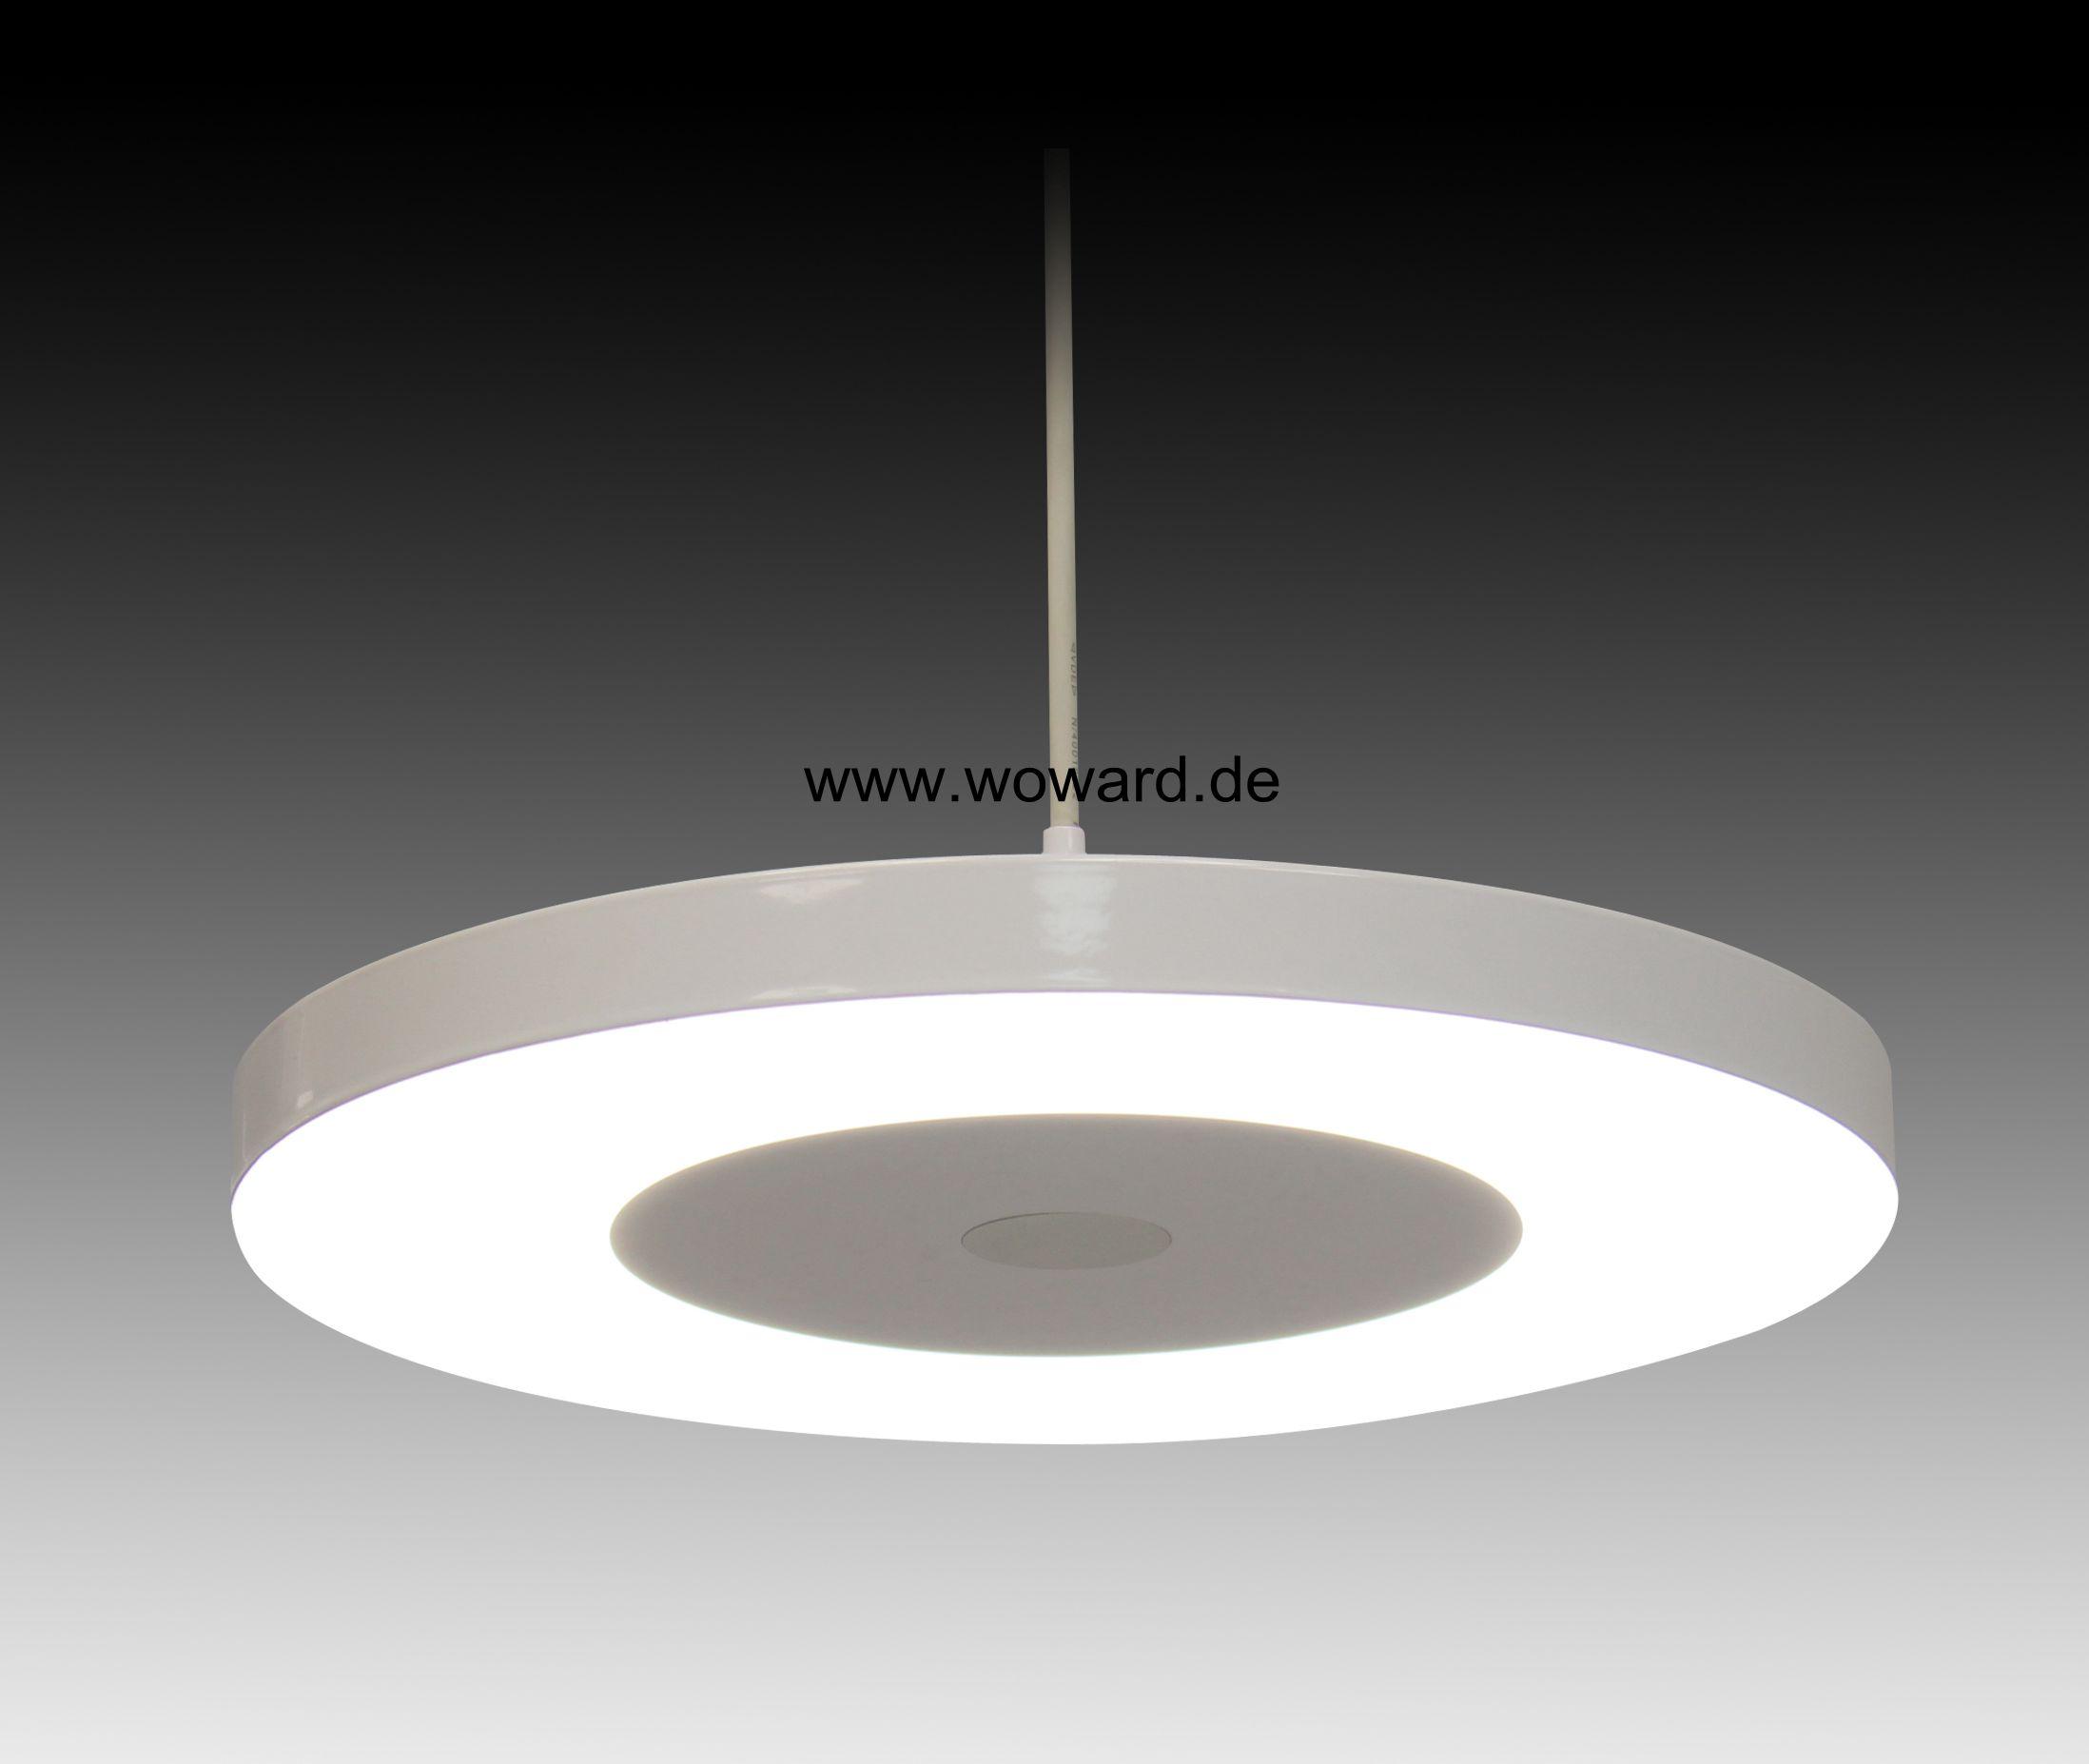 Led h nge 30w deckenlampe leuchte pendel wo 013 30w for Deckenlampe viereckig